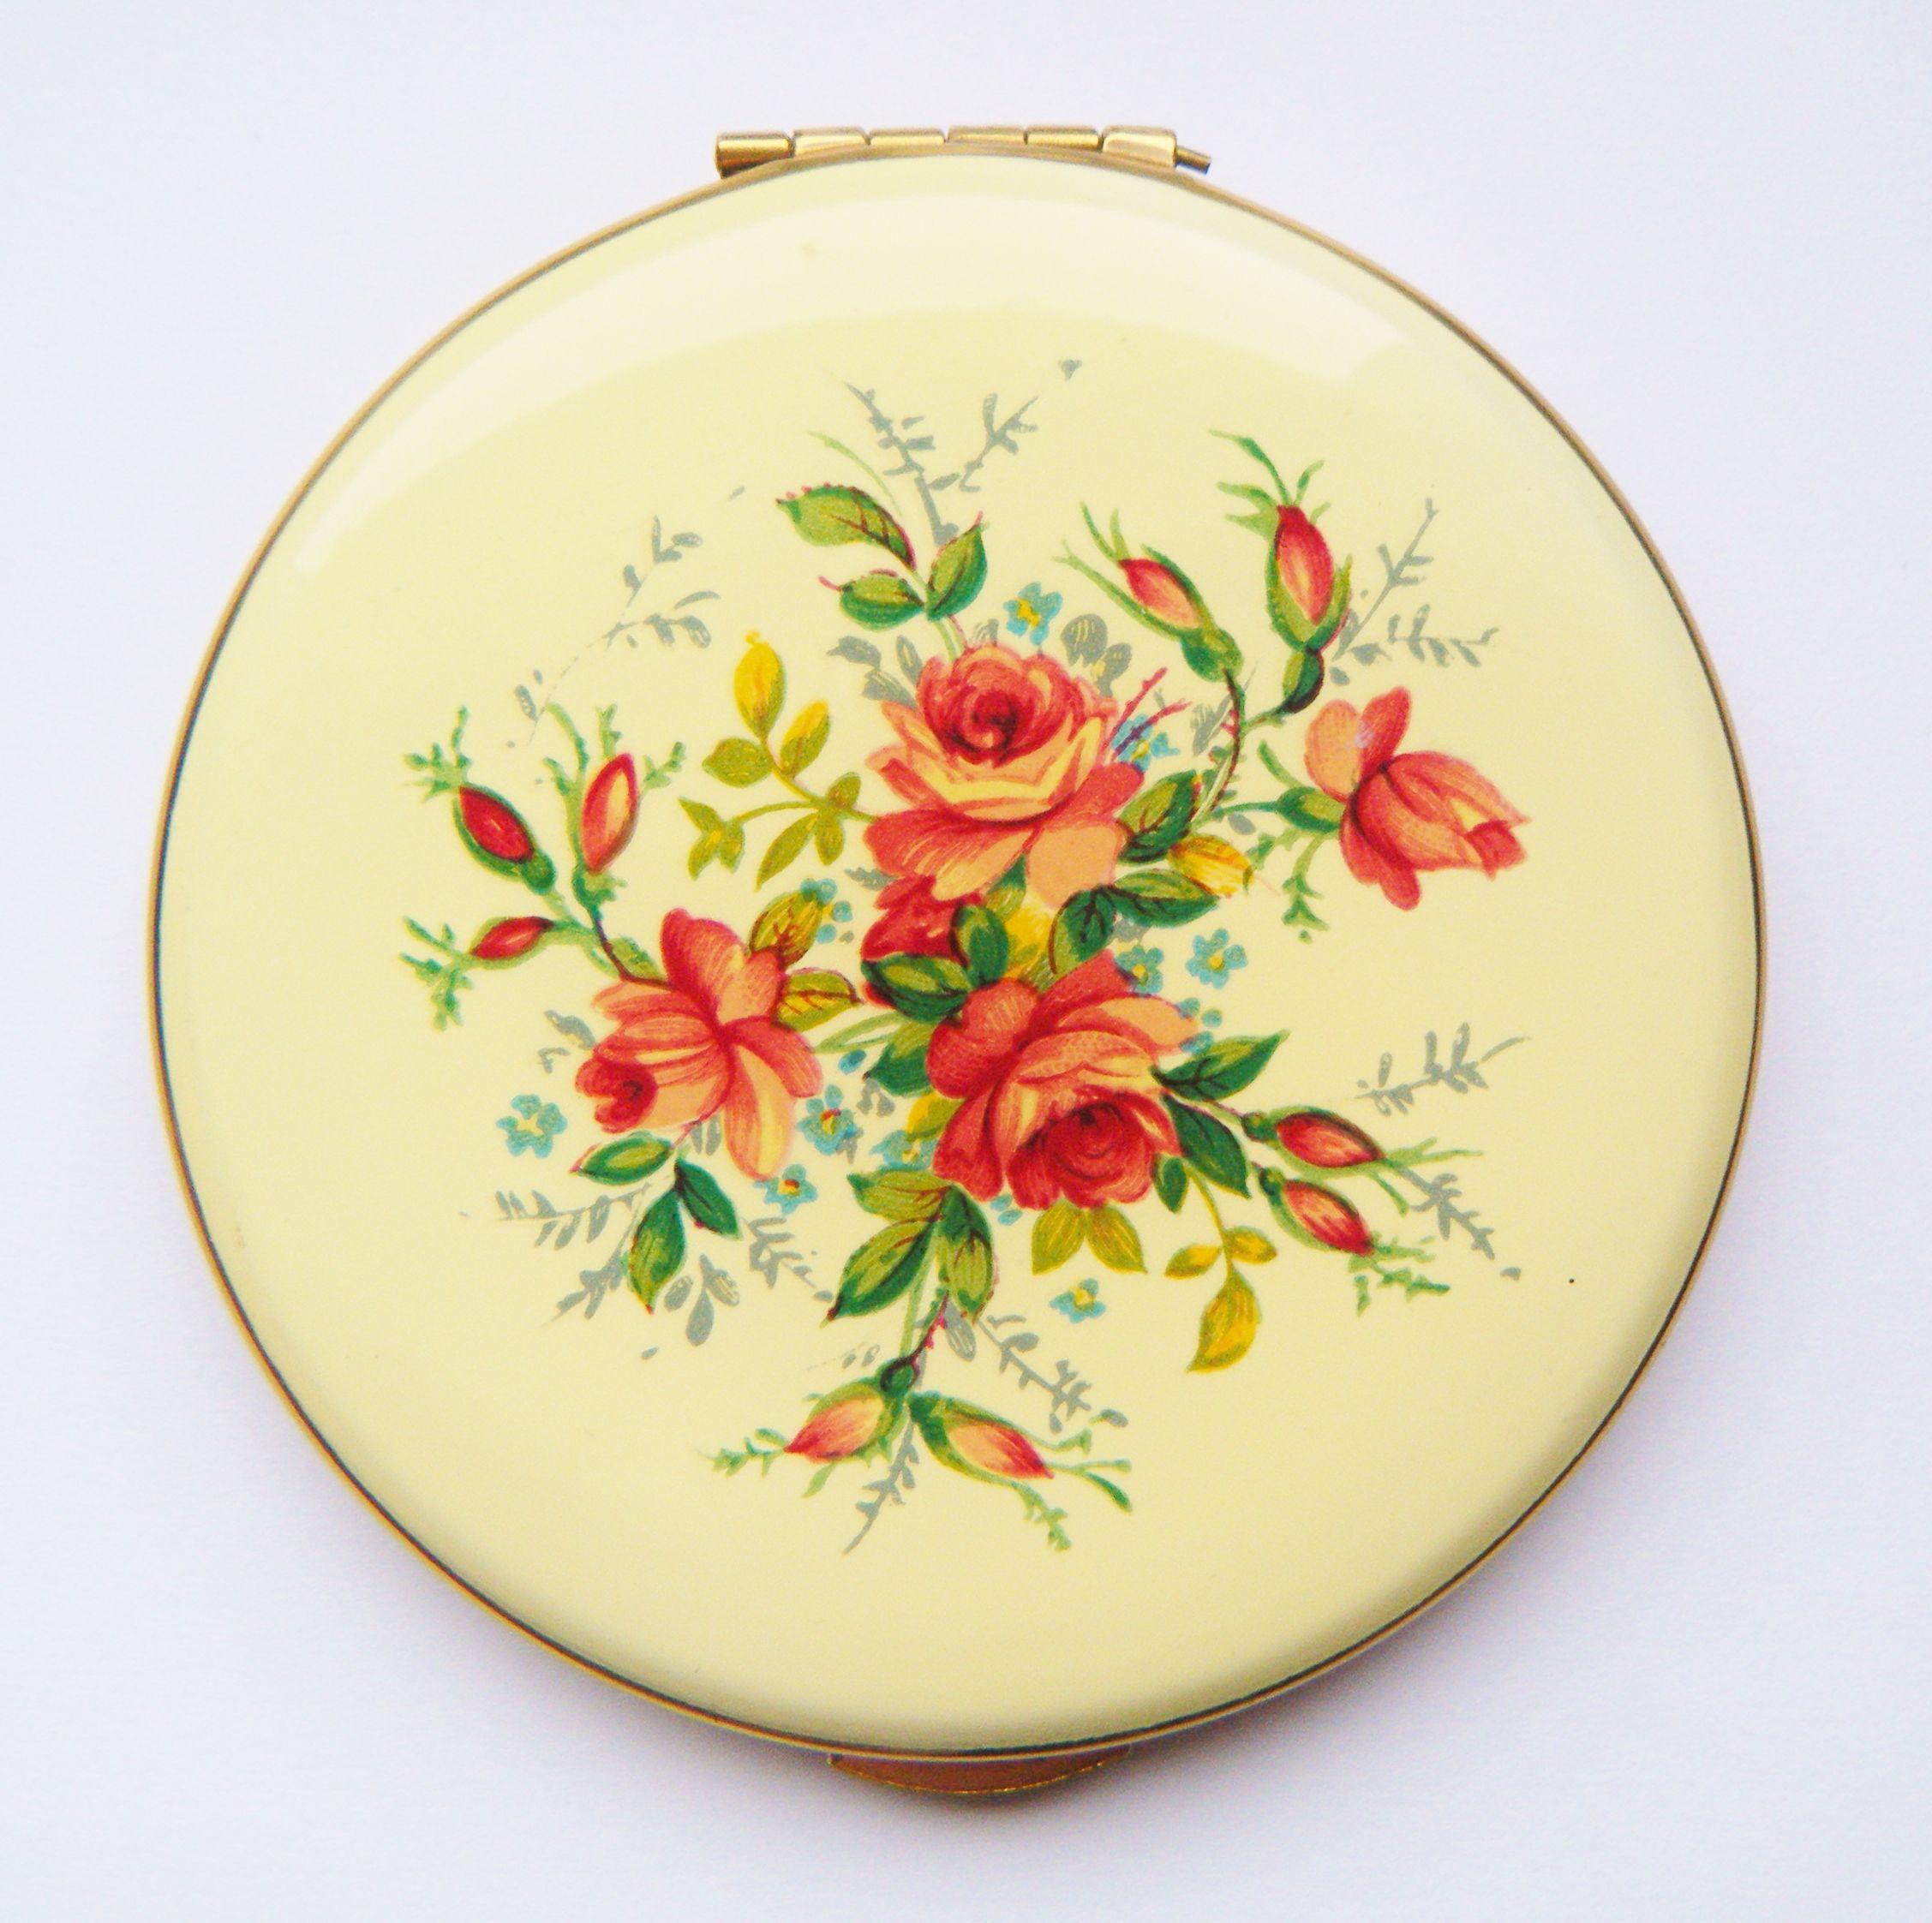 Kigu Floral Compact 꽃